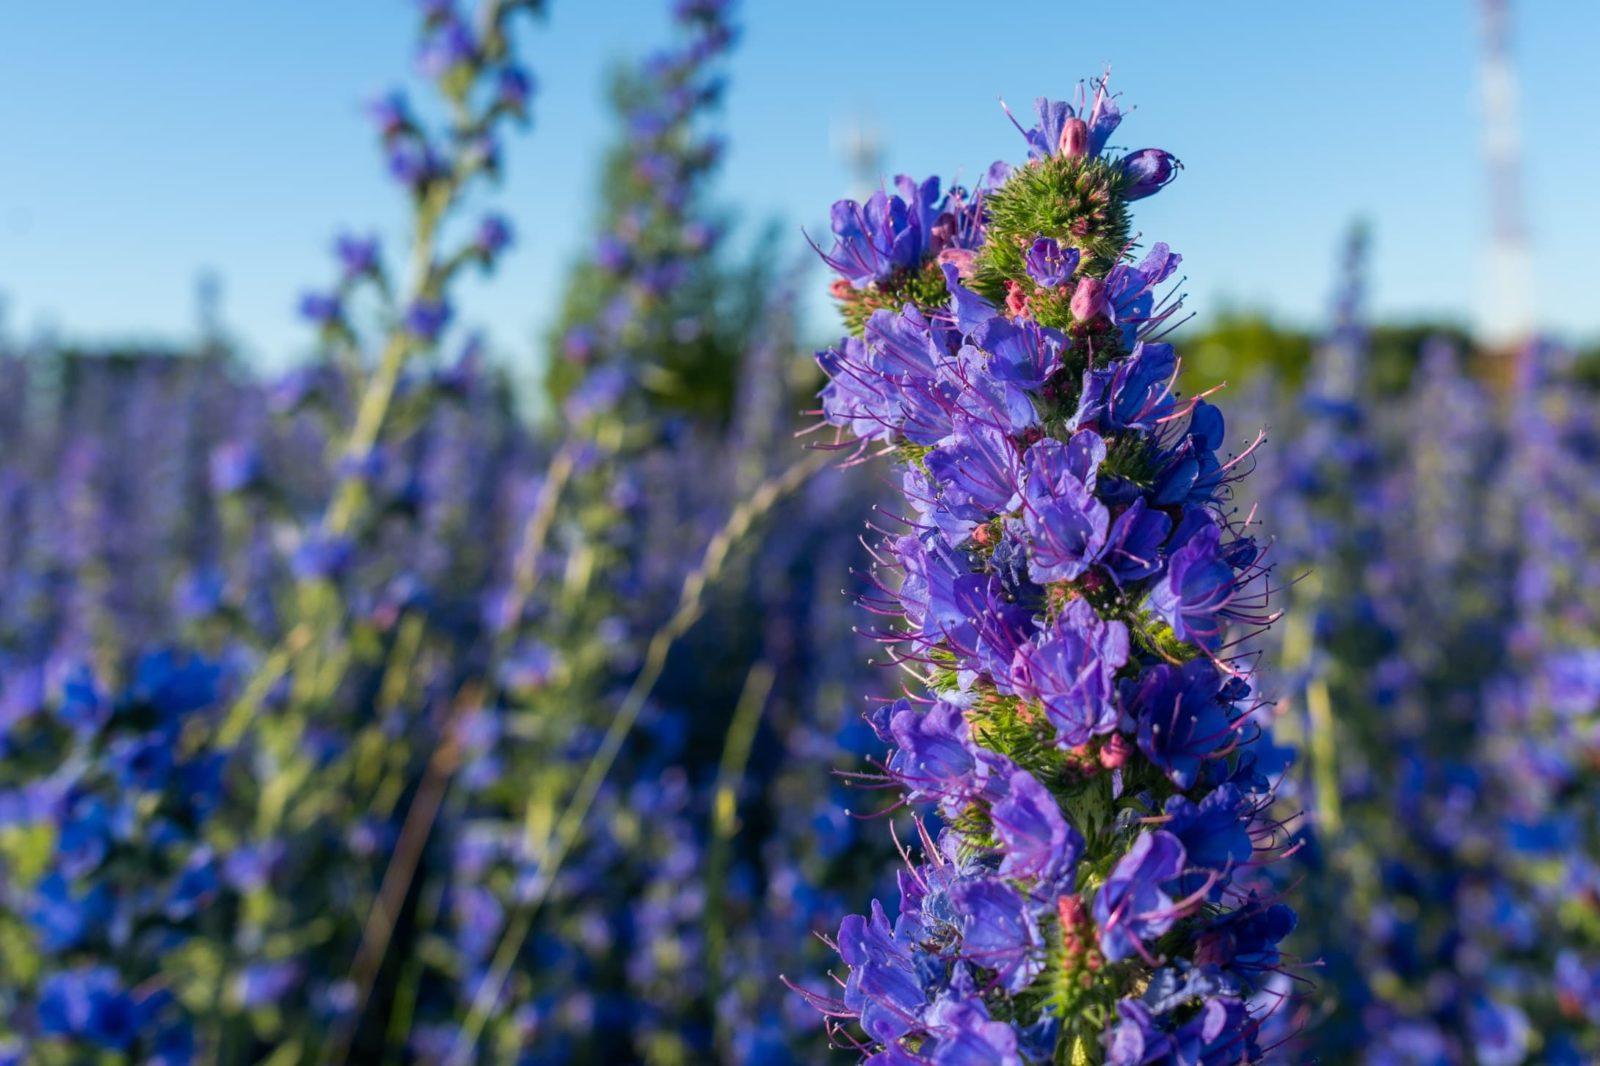 purple echium blooms in a meadow